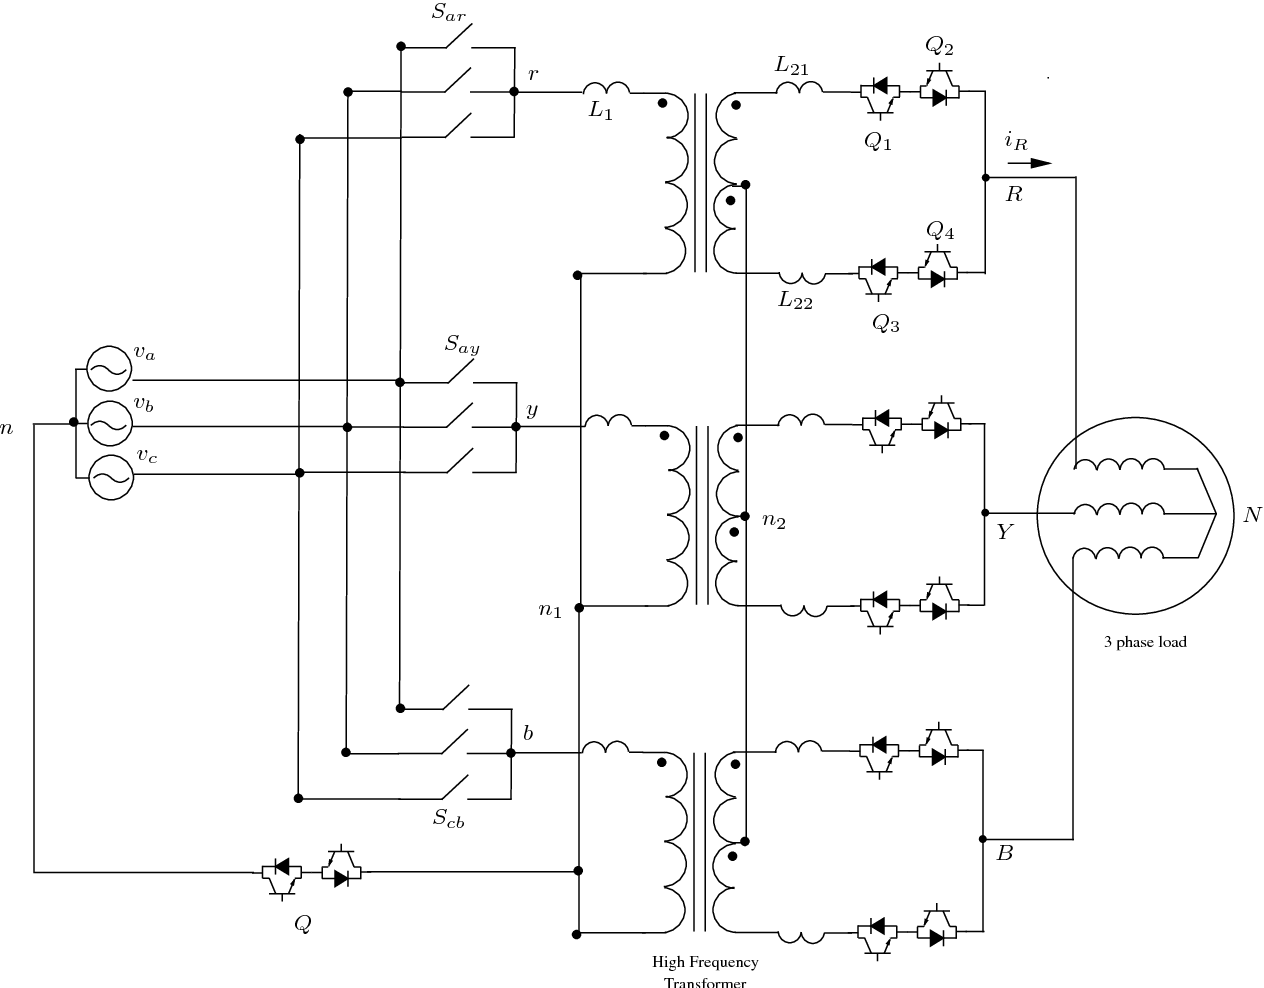 A threephase acac power electronic transformerbased PWM ac drive